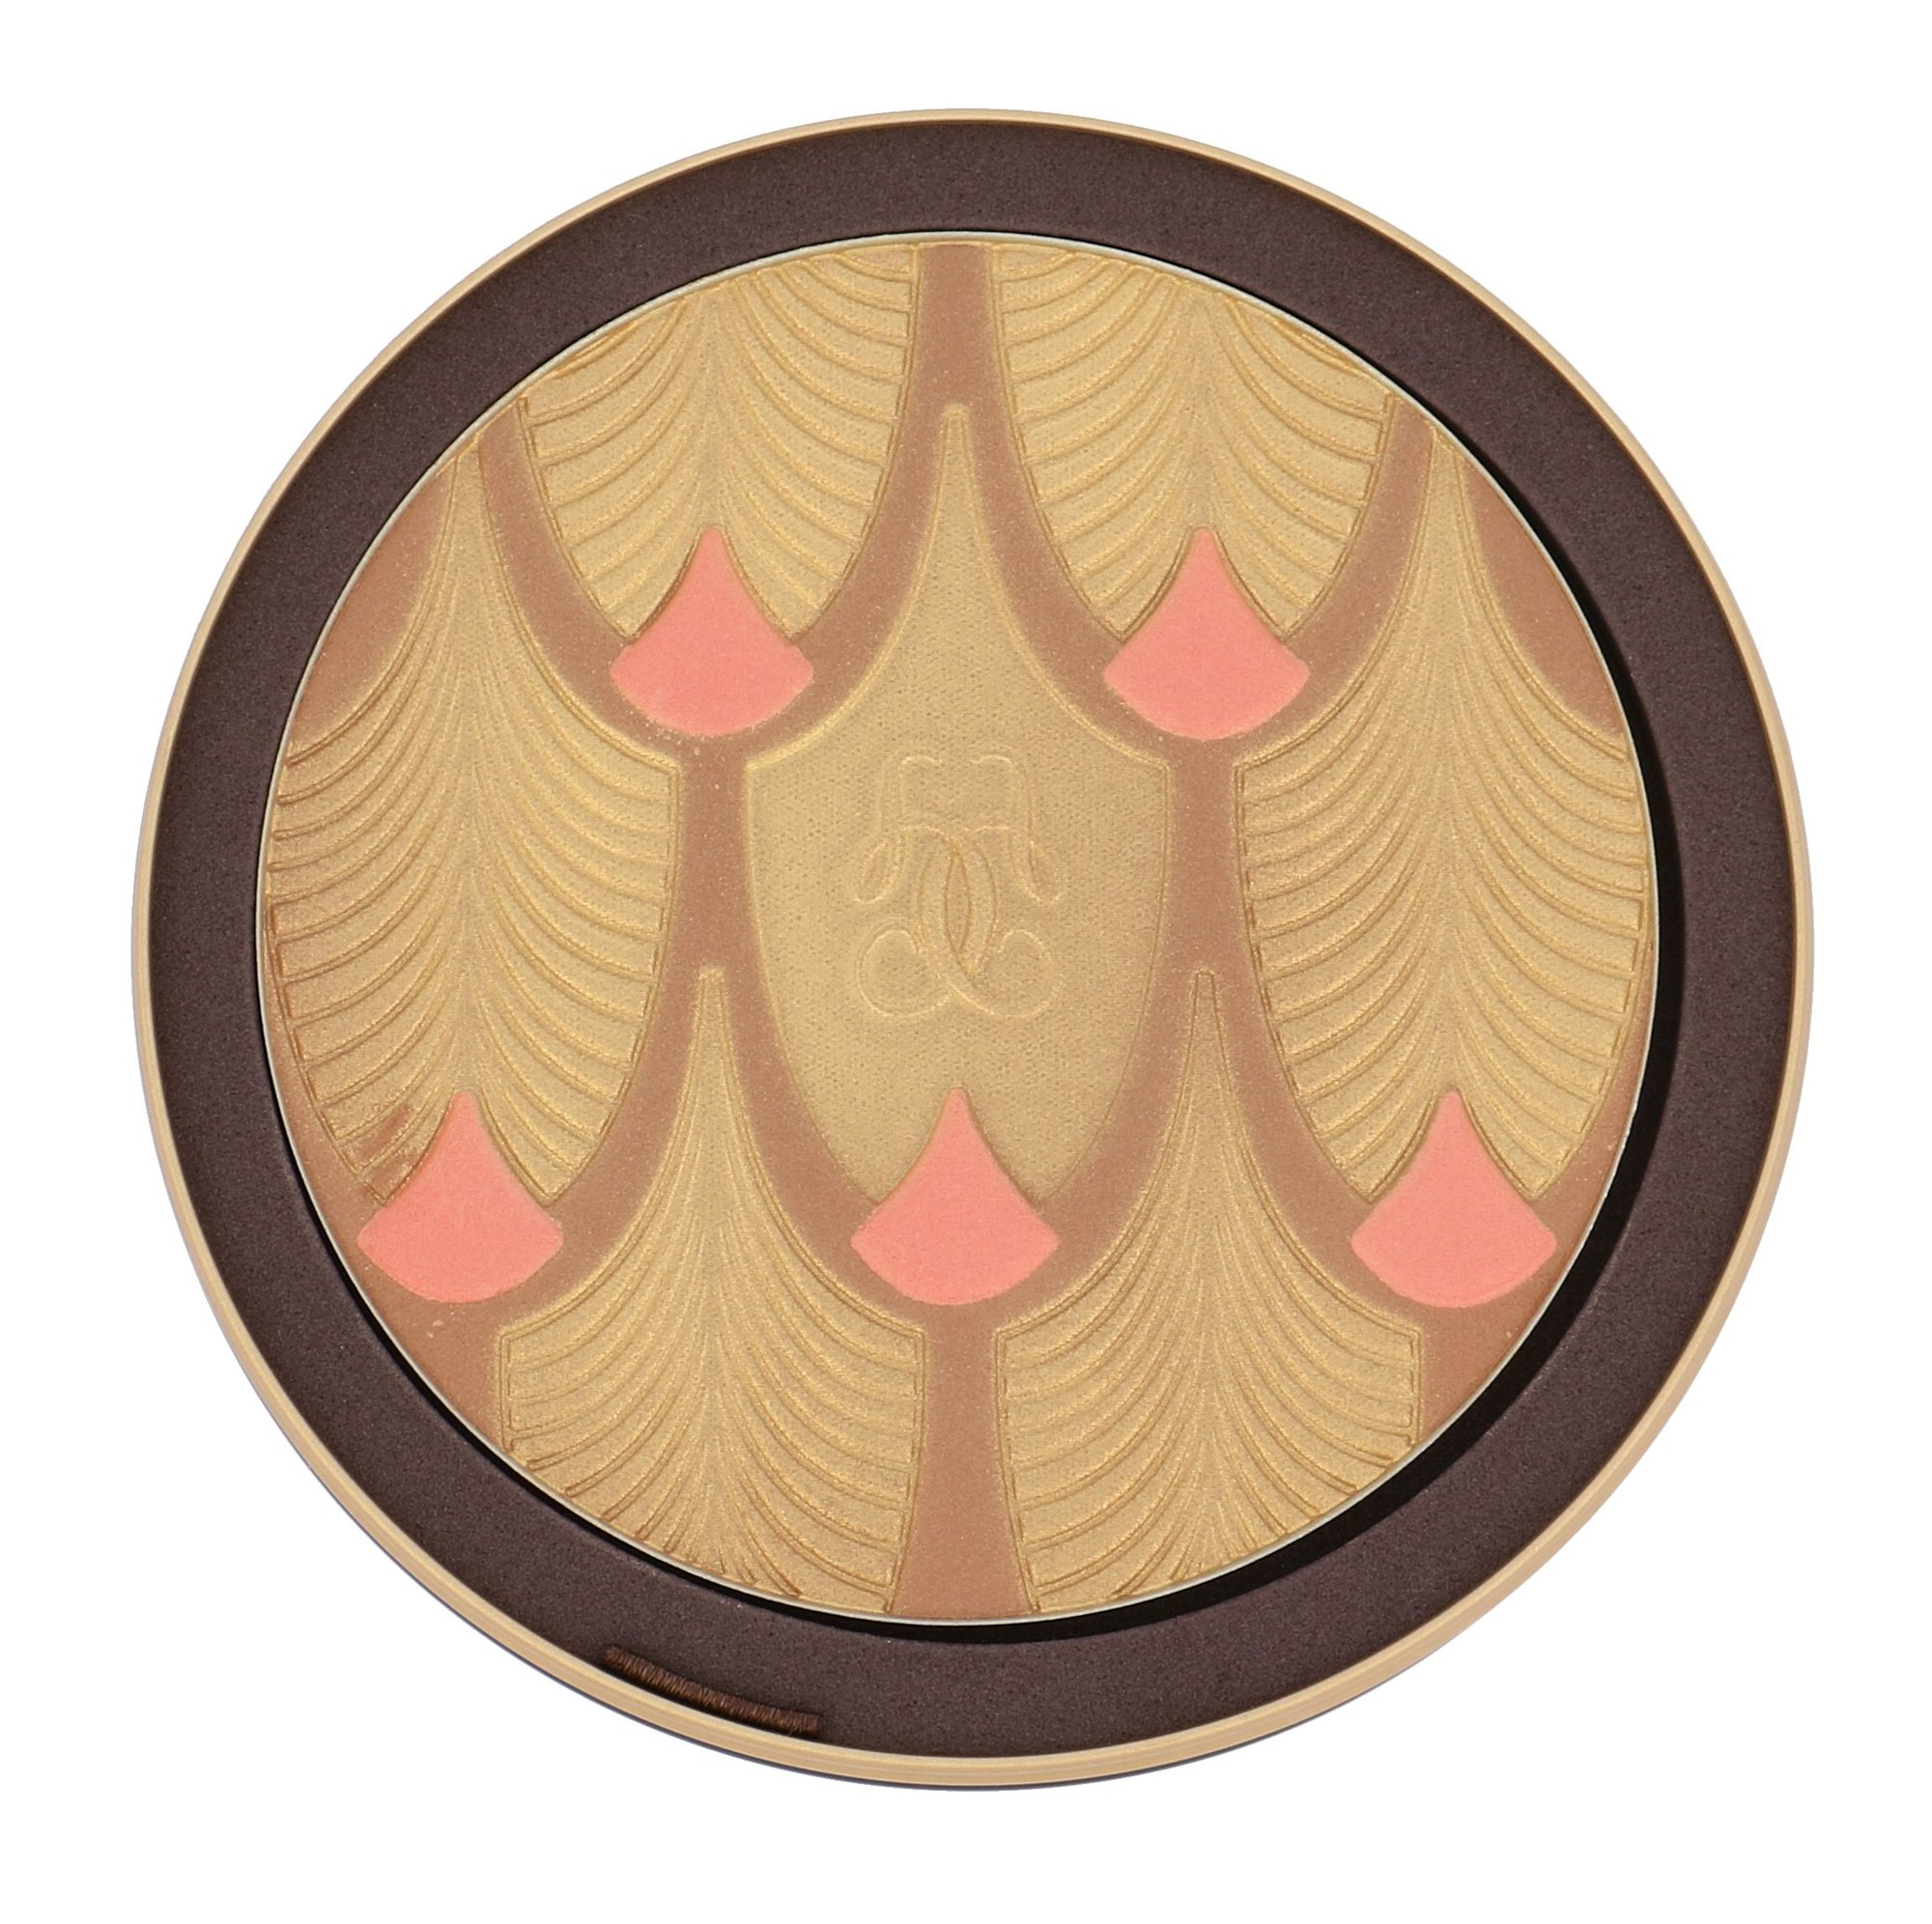 Guerlain Terracotta Cosmetic 18ml